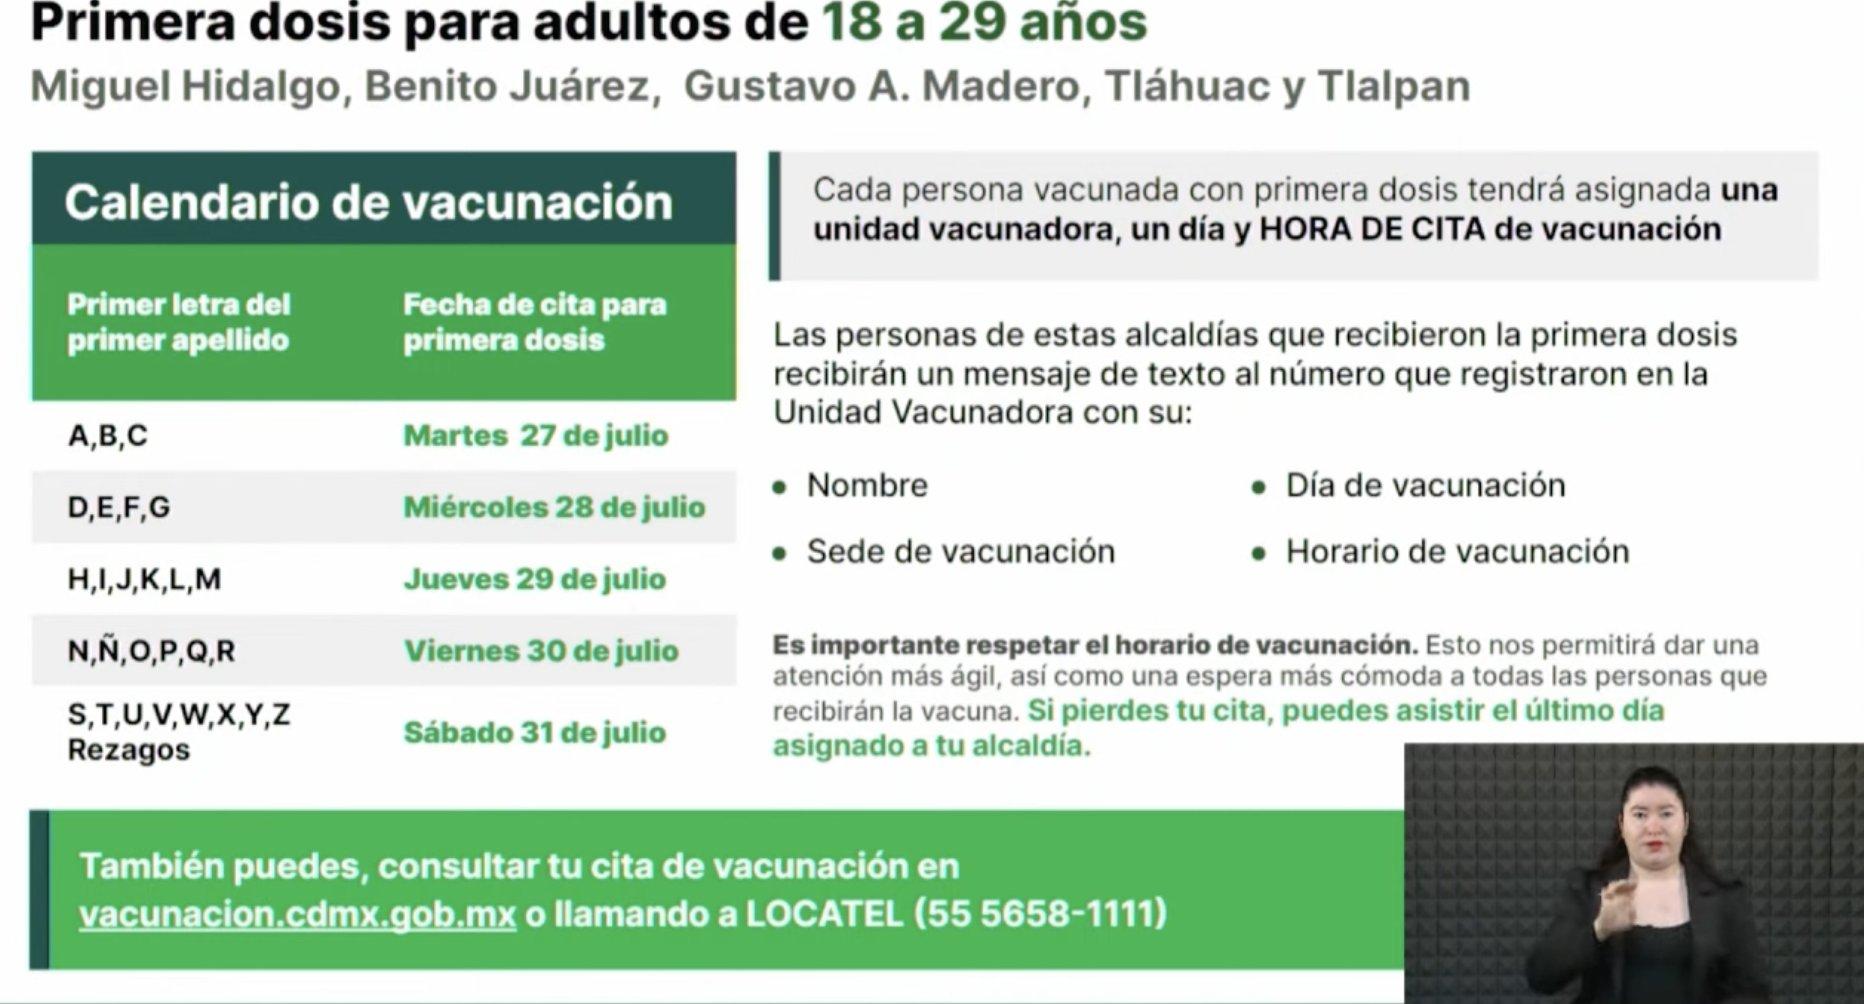 calendario-vacunacion-18-29-anos